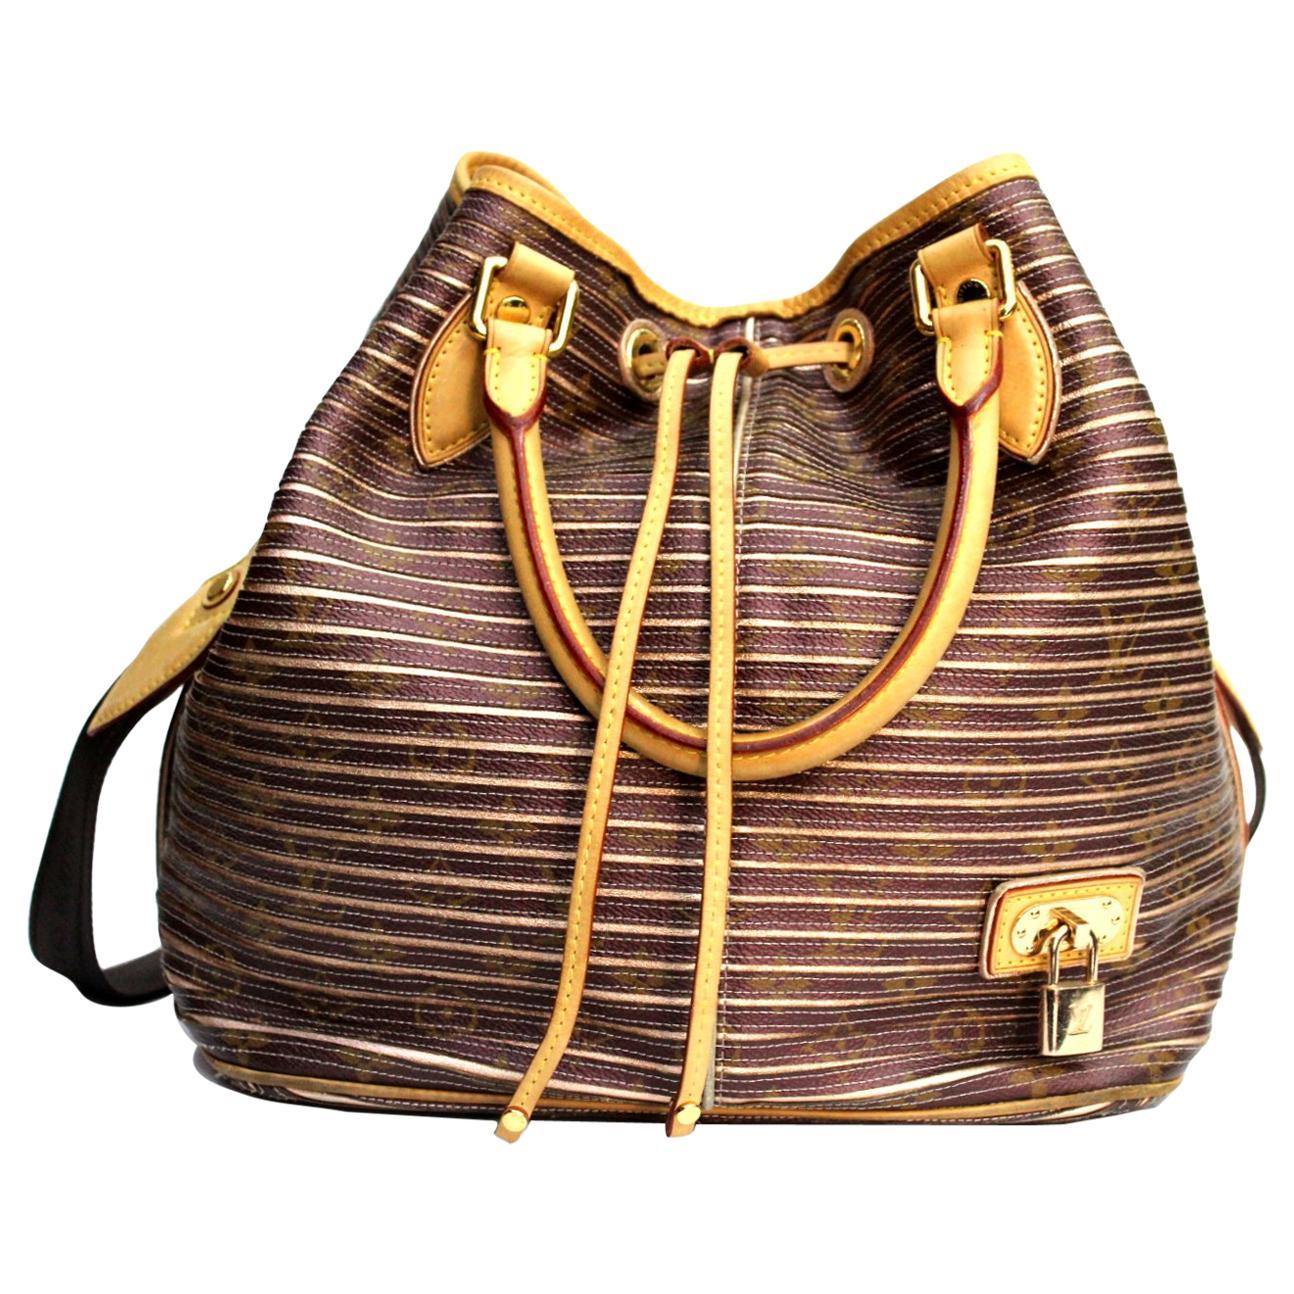 Louis Vuitton Eden Neo Peche Monogram Limited Edition Bag